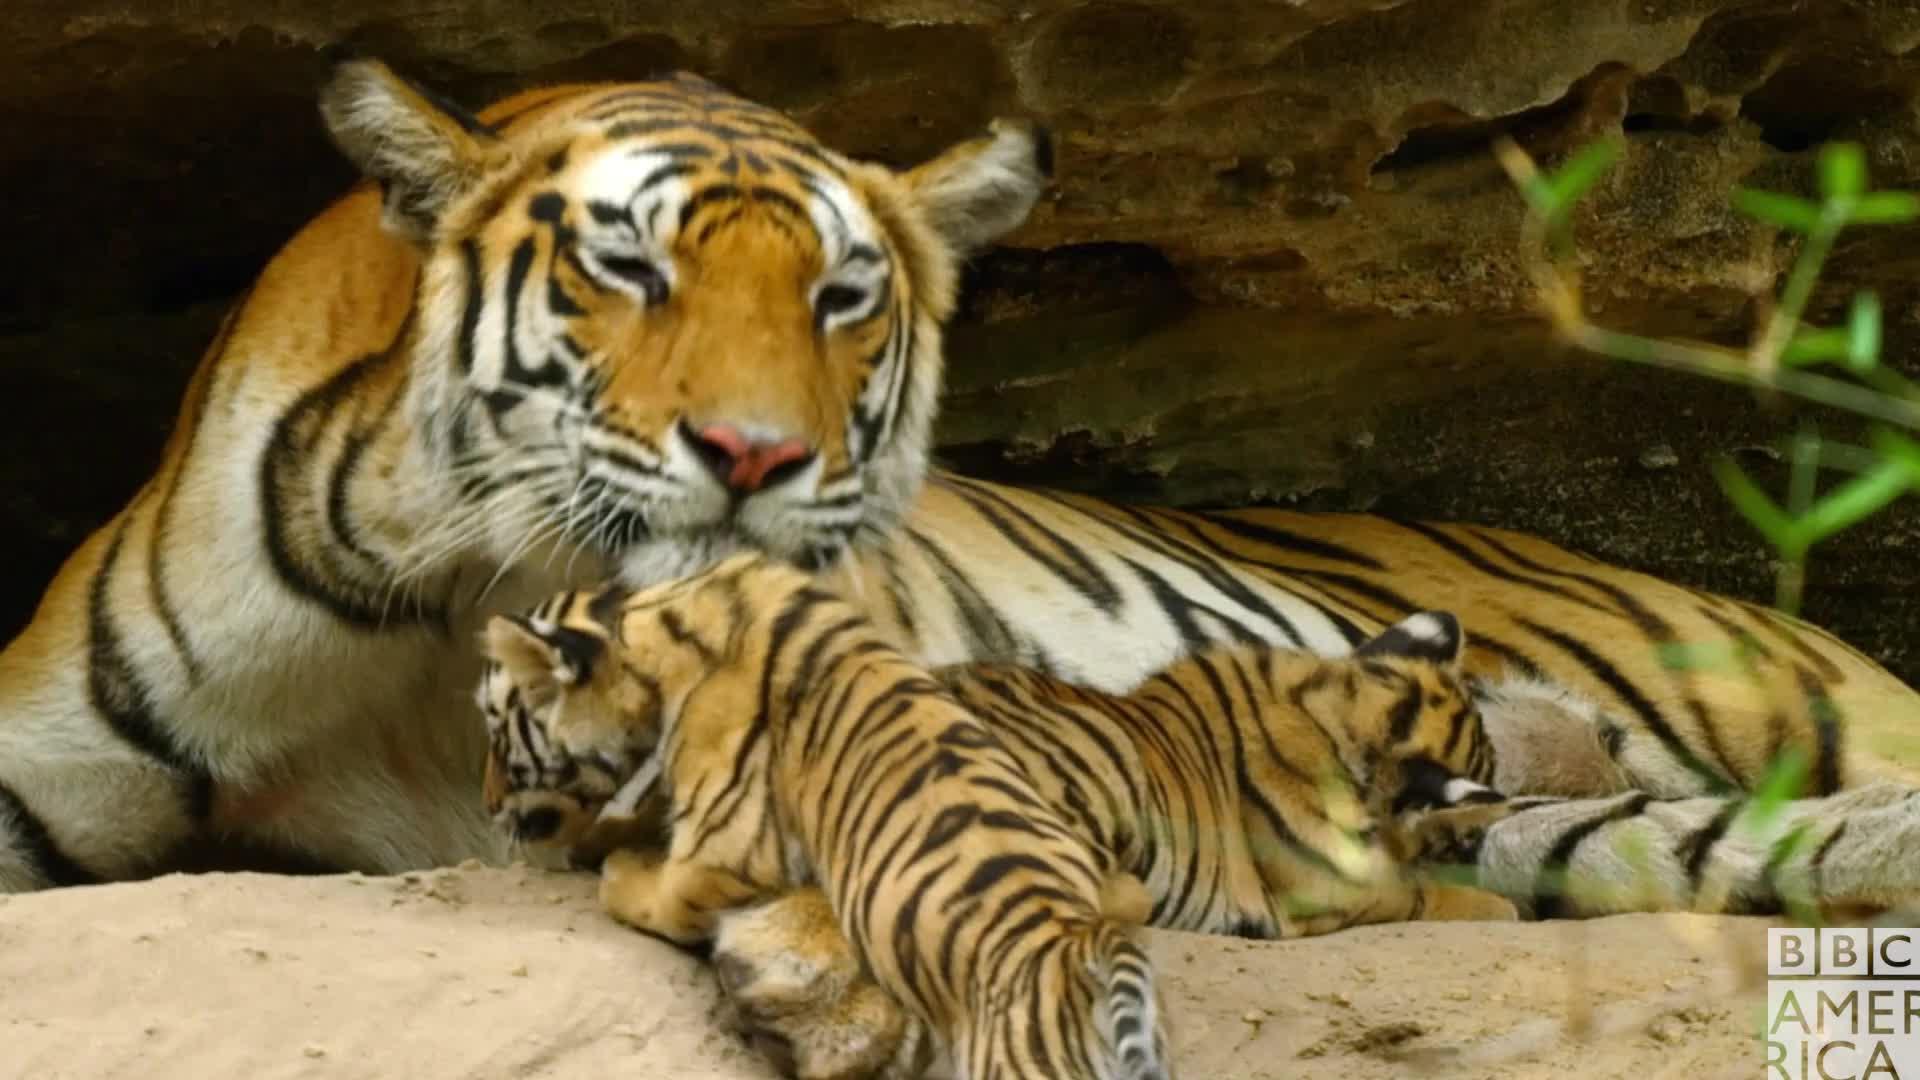 animal, animals, awww, bbc america, bbc america dynasties, bbc america: dynasties, dynasties, kiss, kisses, love, tiger, tigers, Dynasties Raj Bhera Tiger Licking Cub GIFs